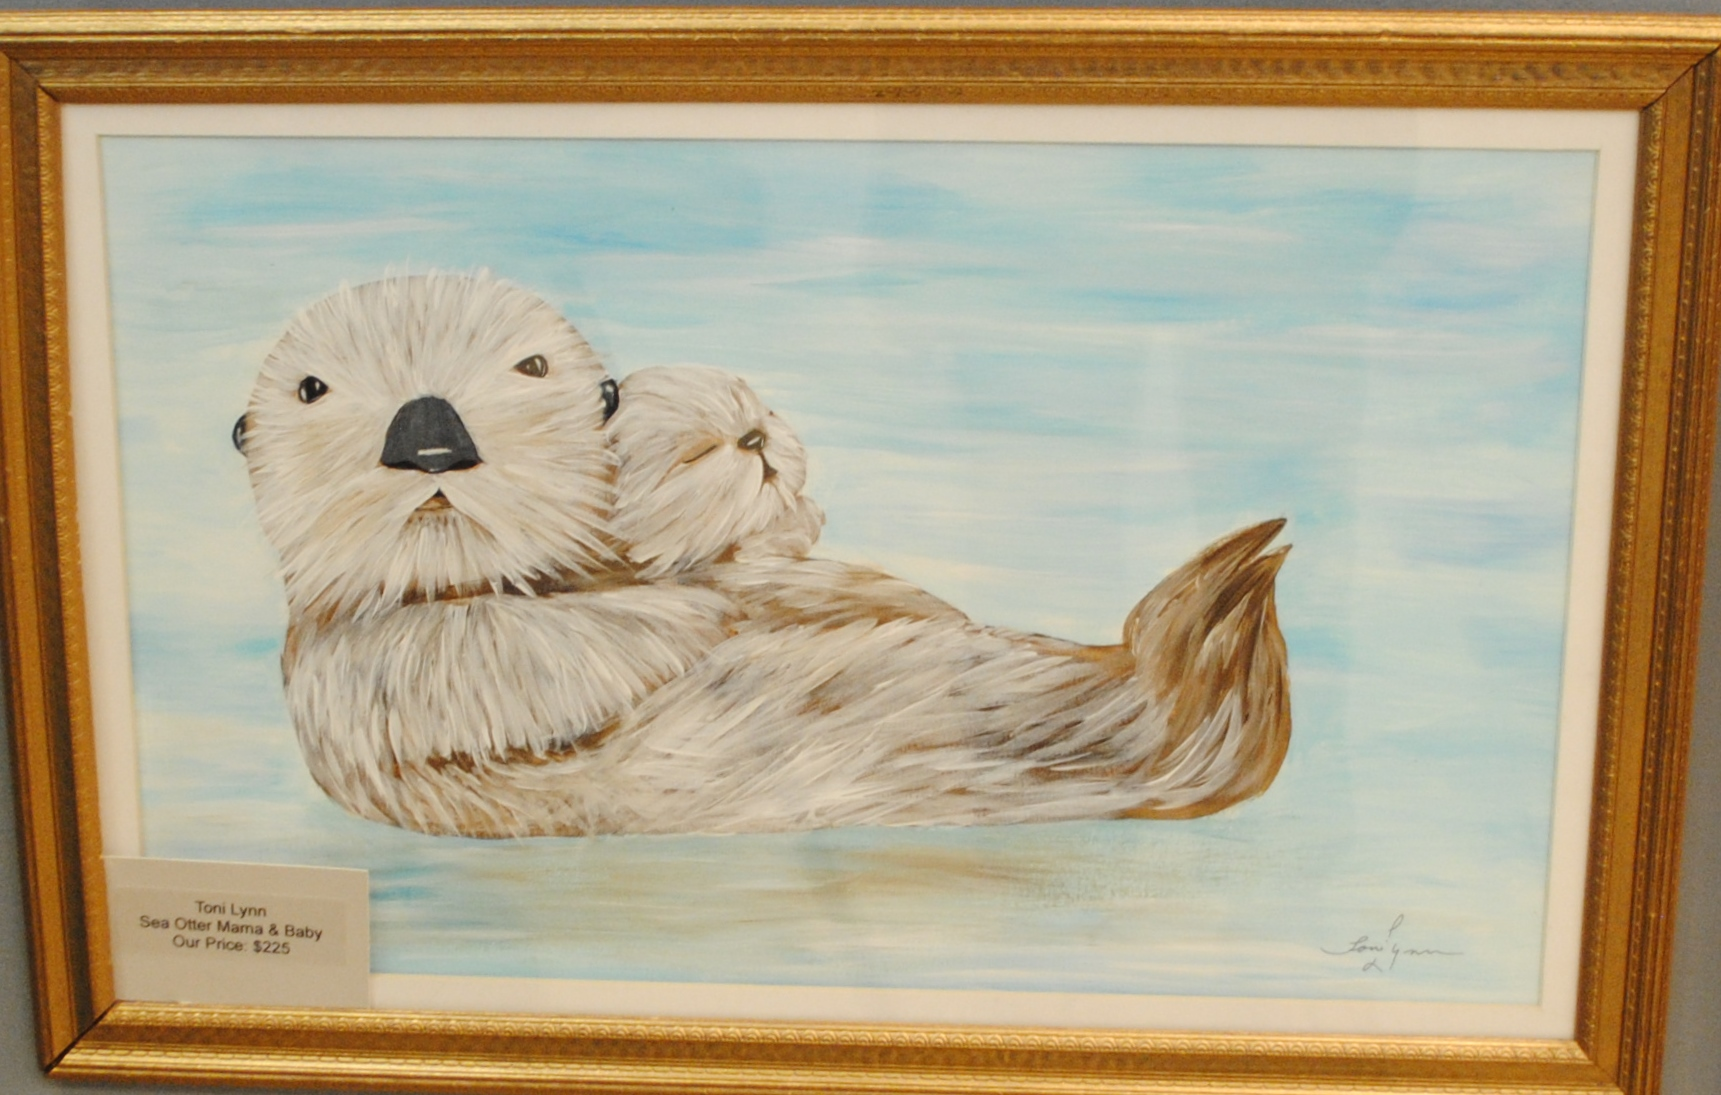 Toni Lynn Sea Otter Mama And Baby